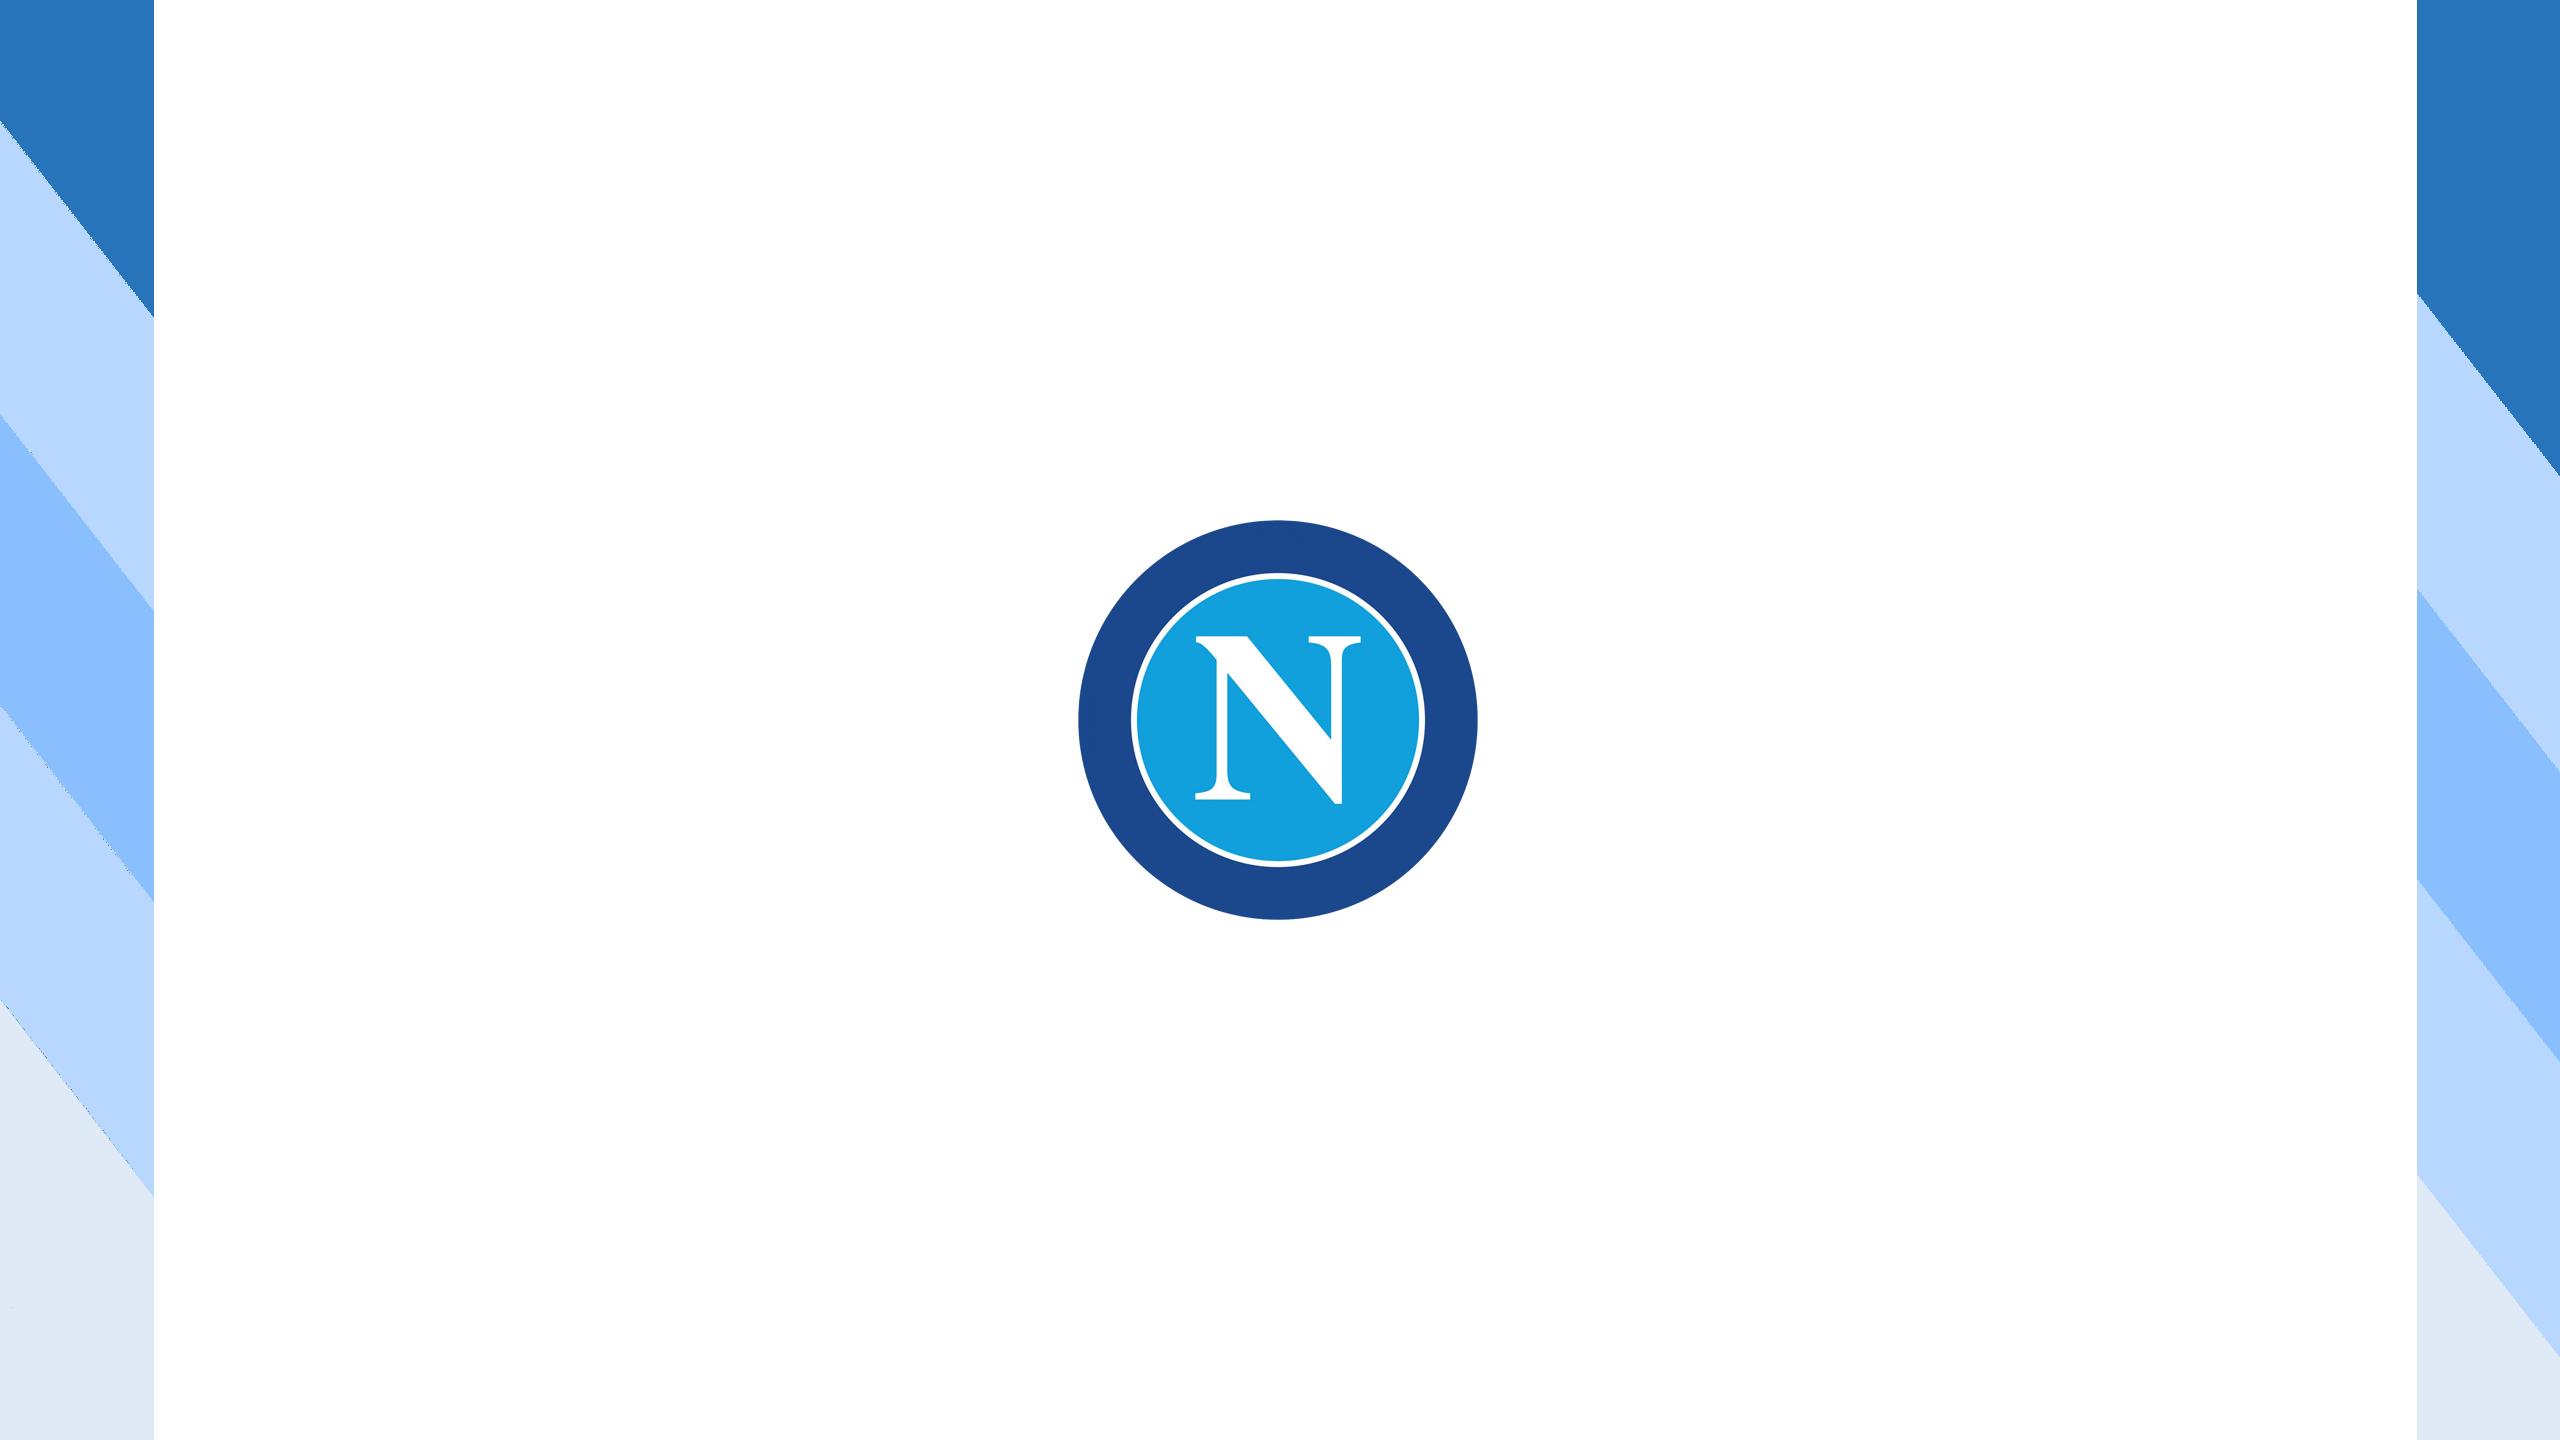 Napoli (Away)